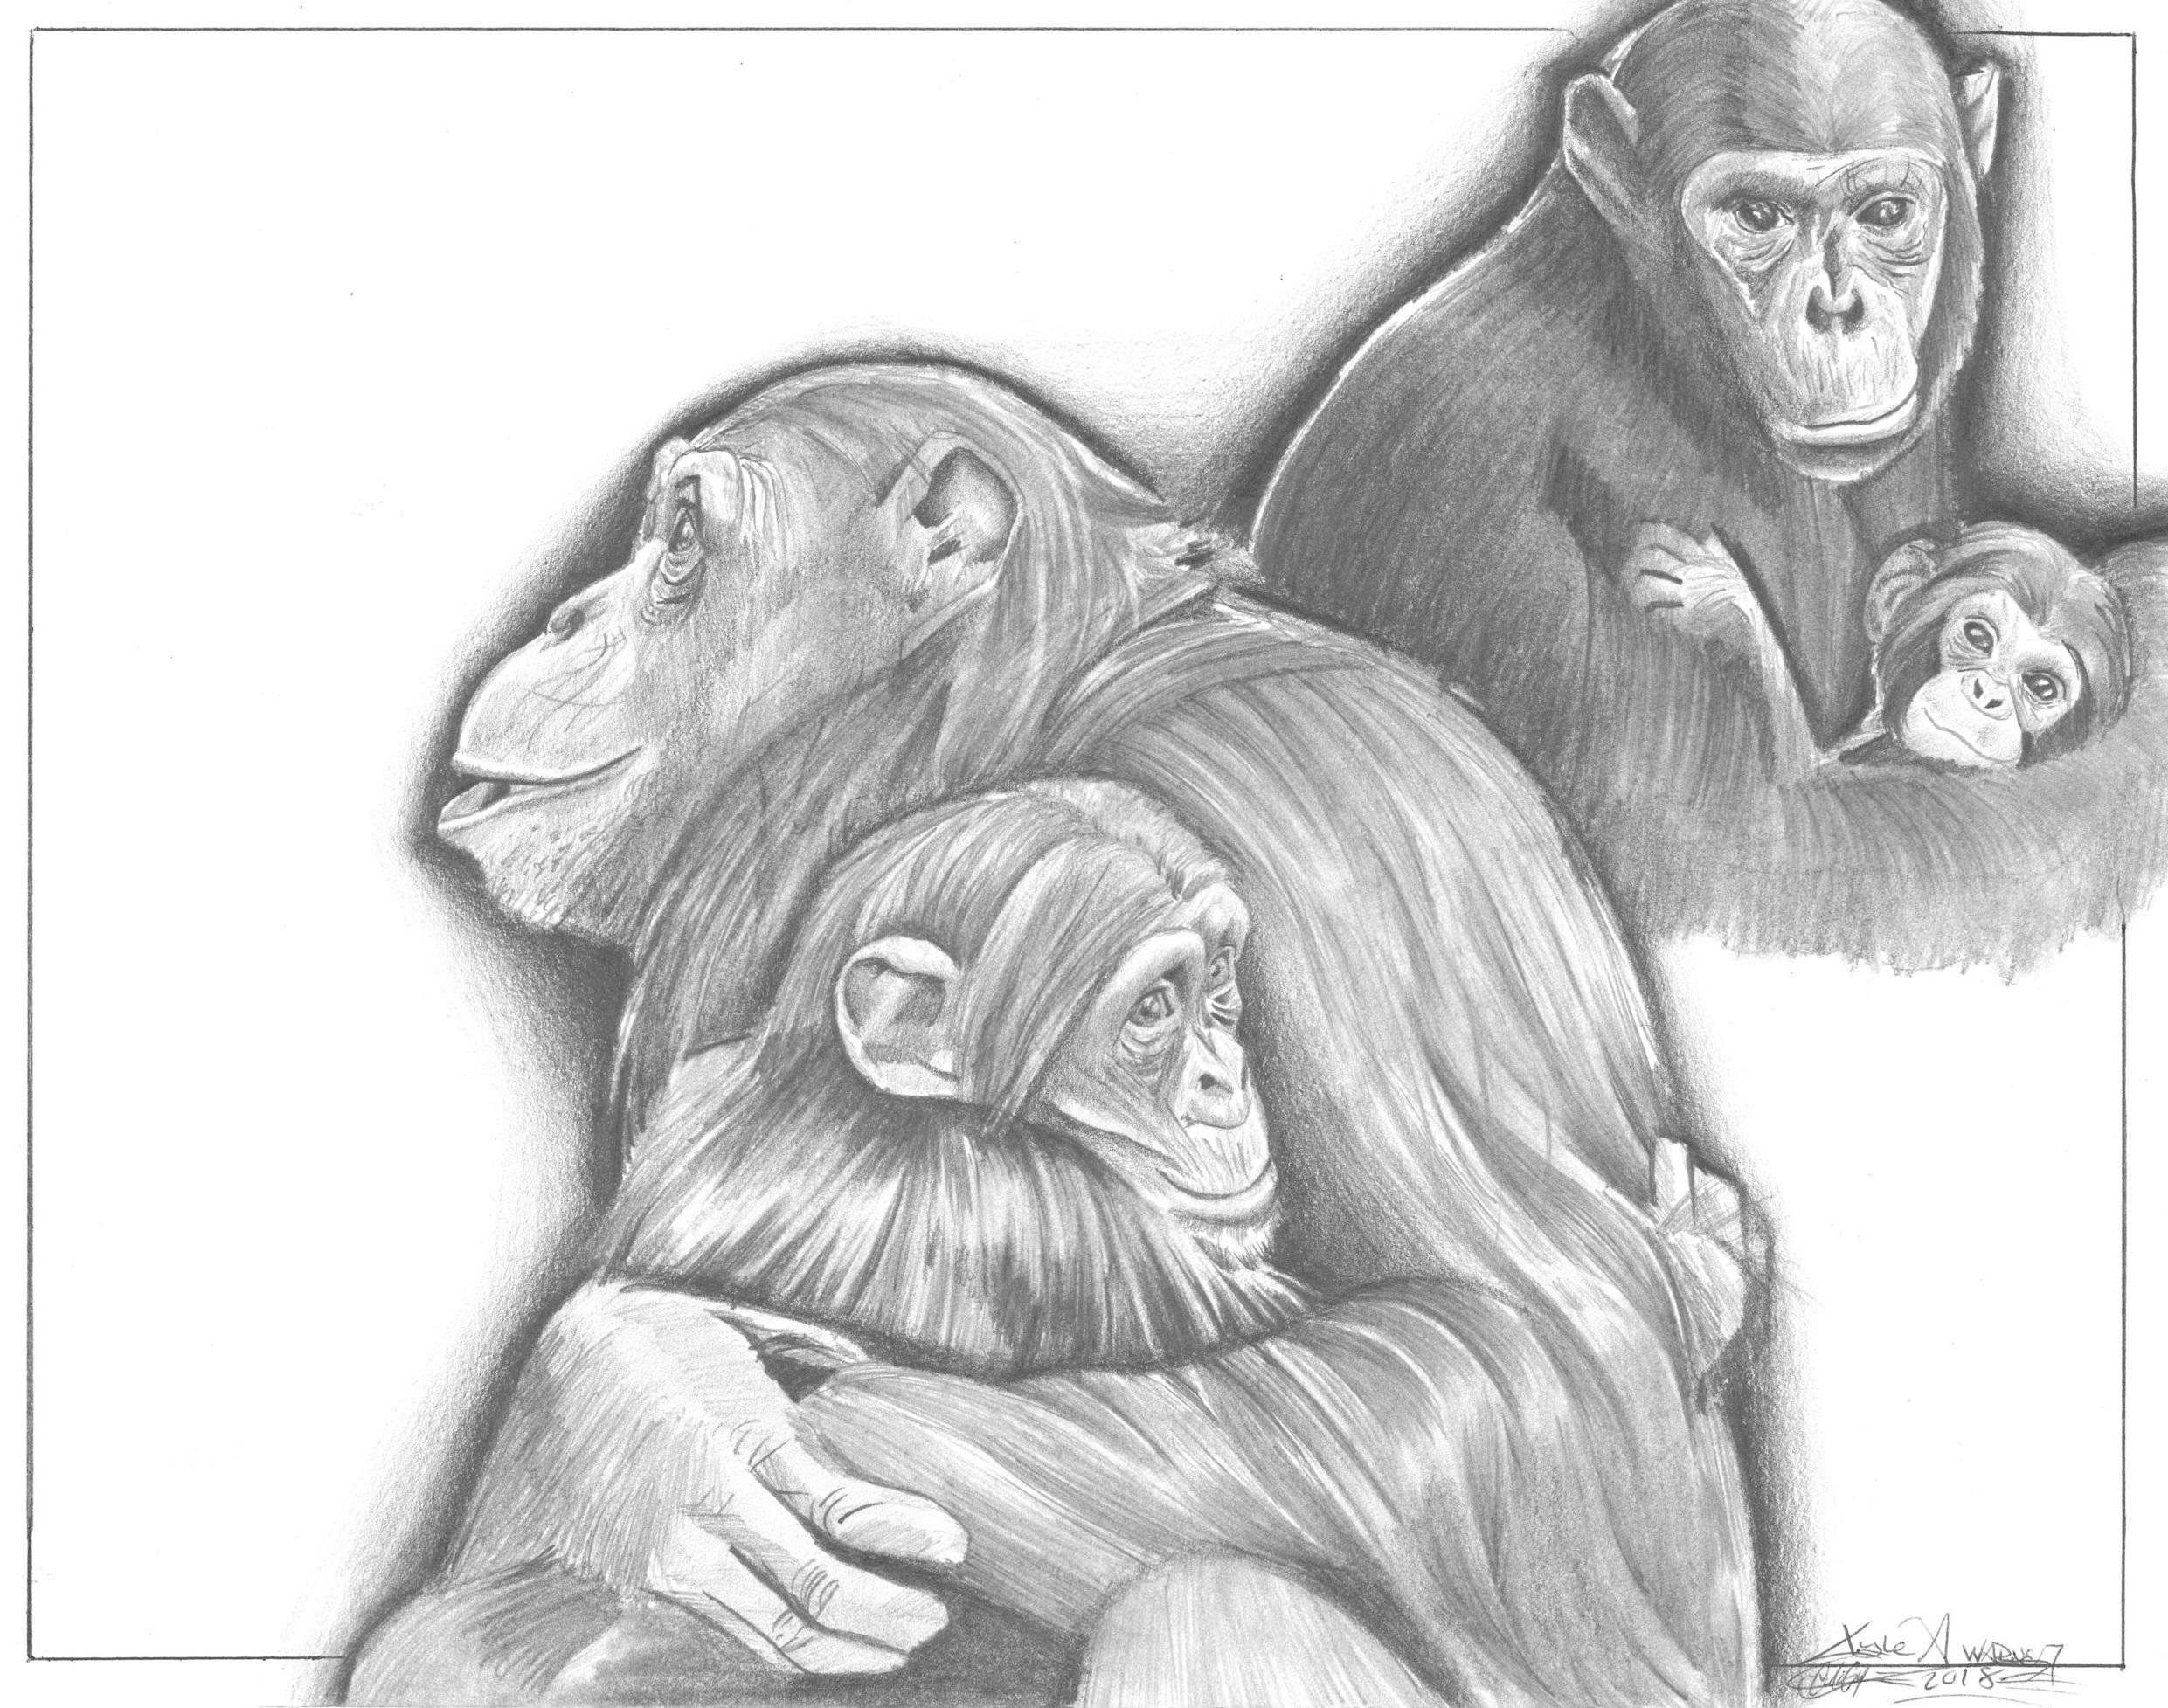 kyles_chimpanzeesforJane.jpg